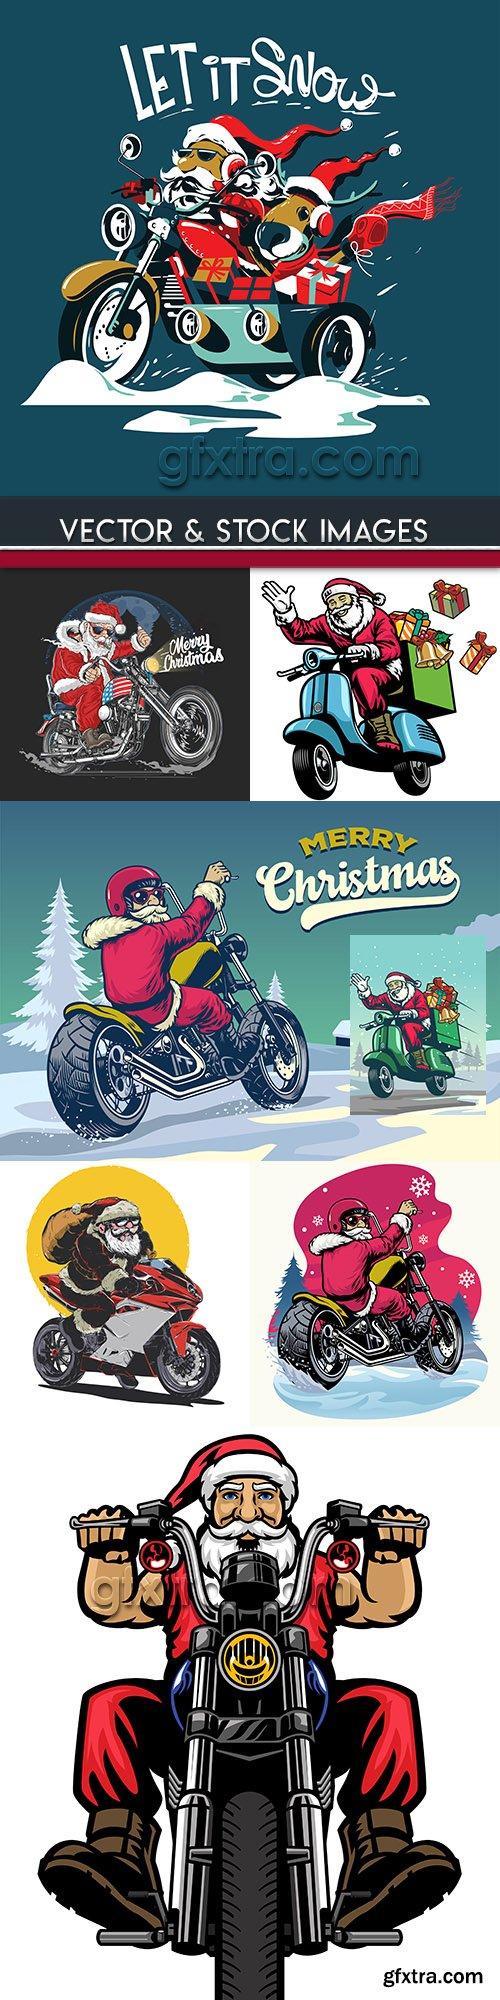 Santa Claus on motorcycle Christmas vintage illustration